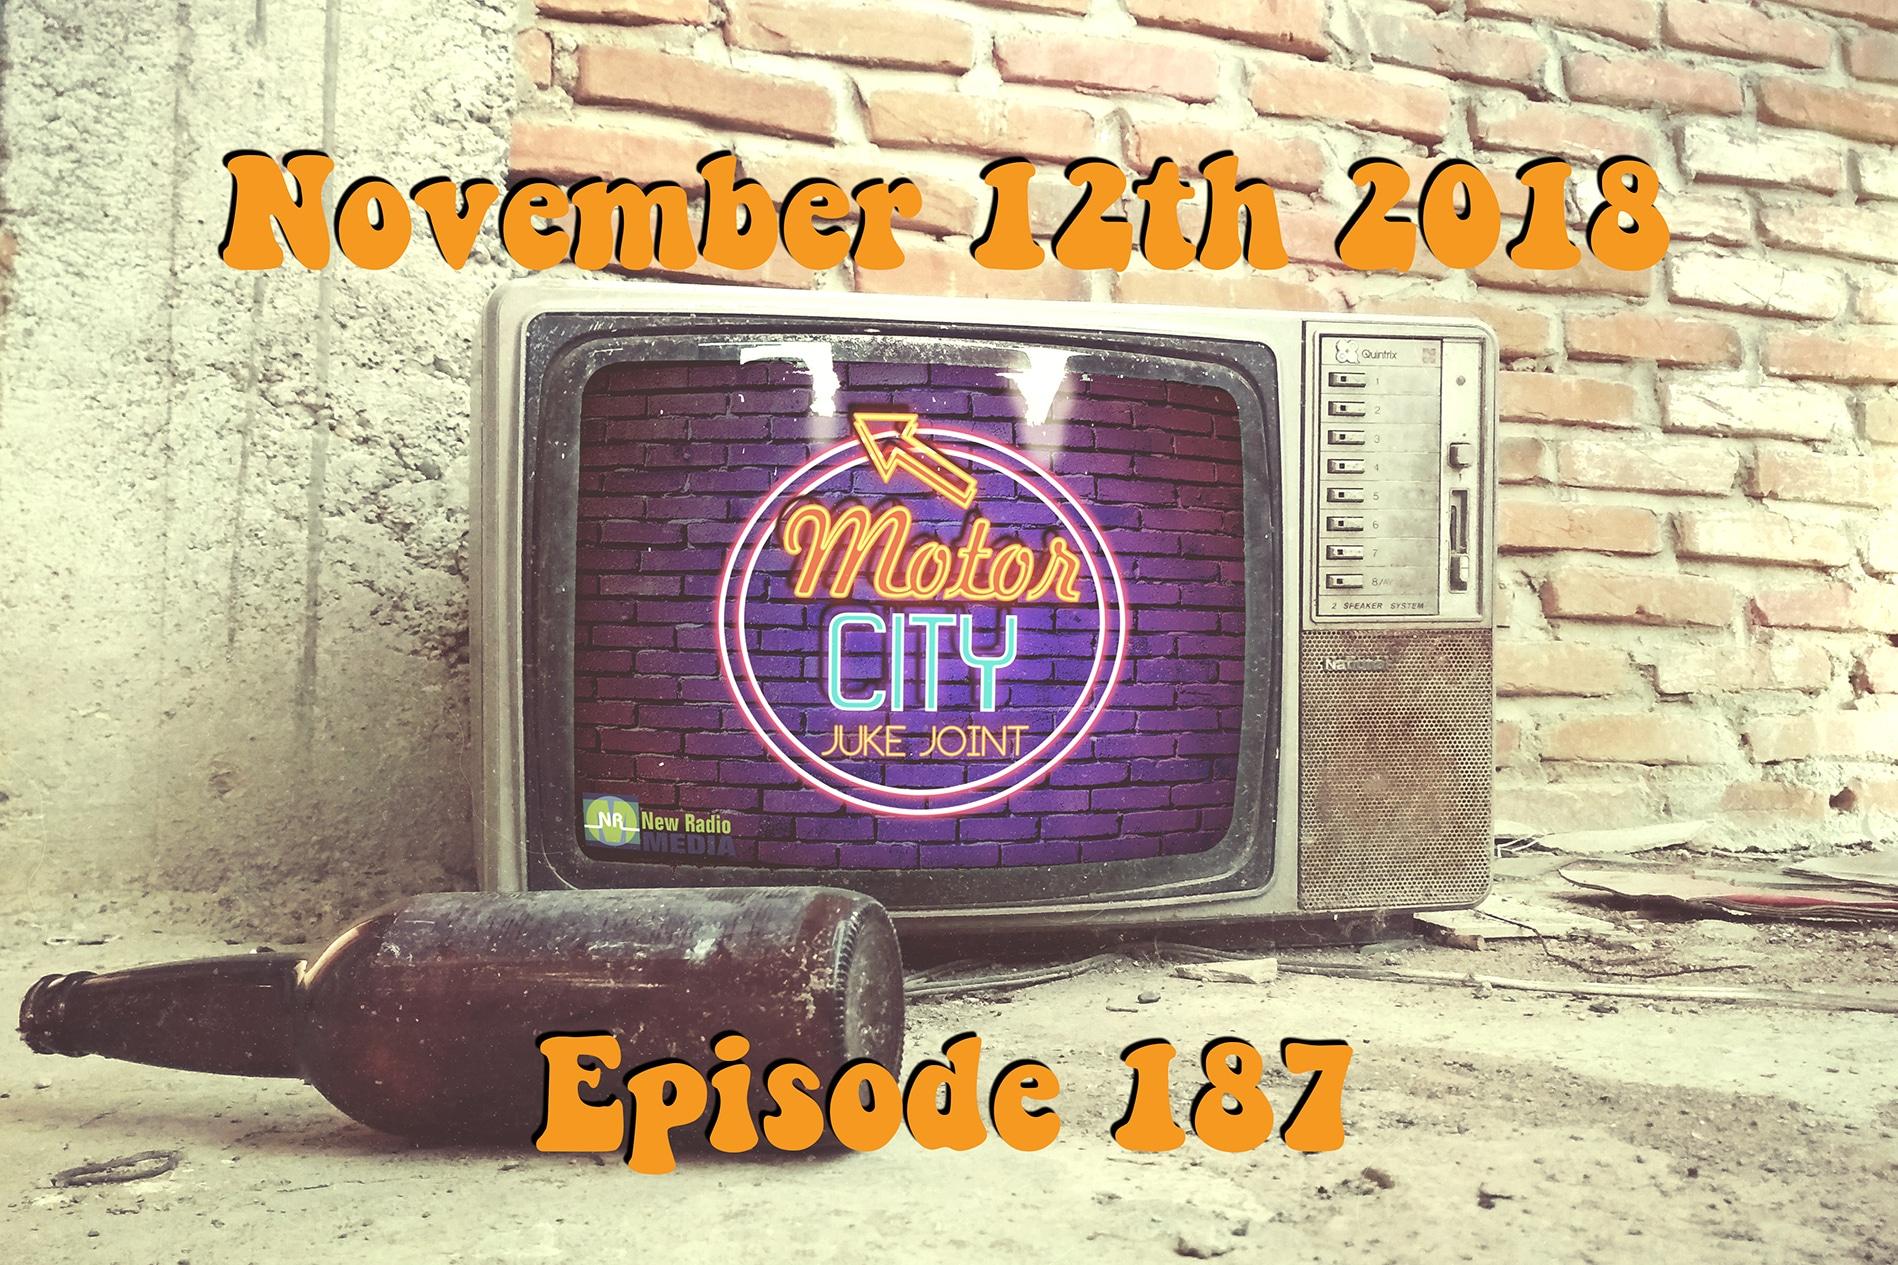 Motor City Juke Joint - Episode 187